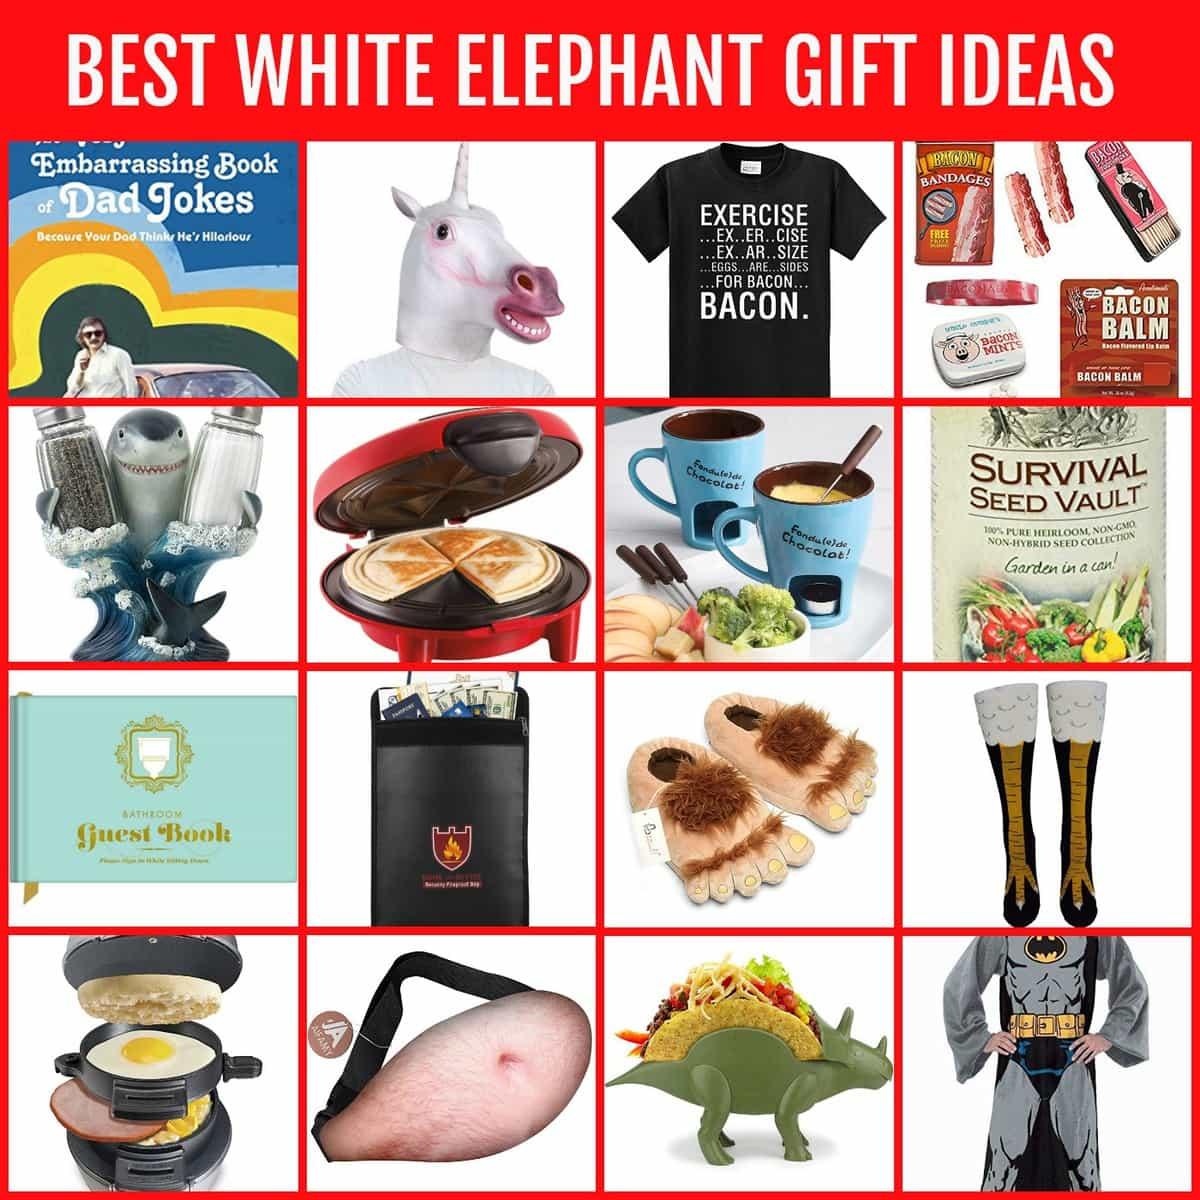 the best white elephant